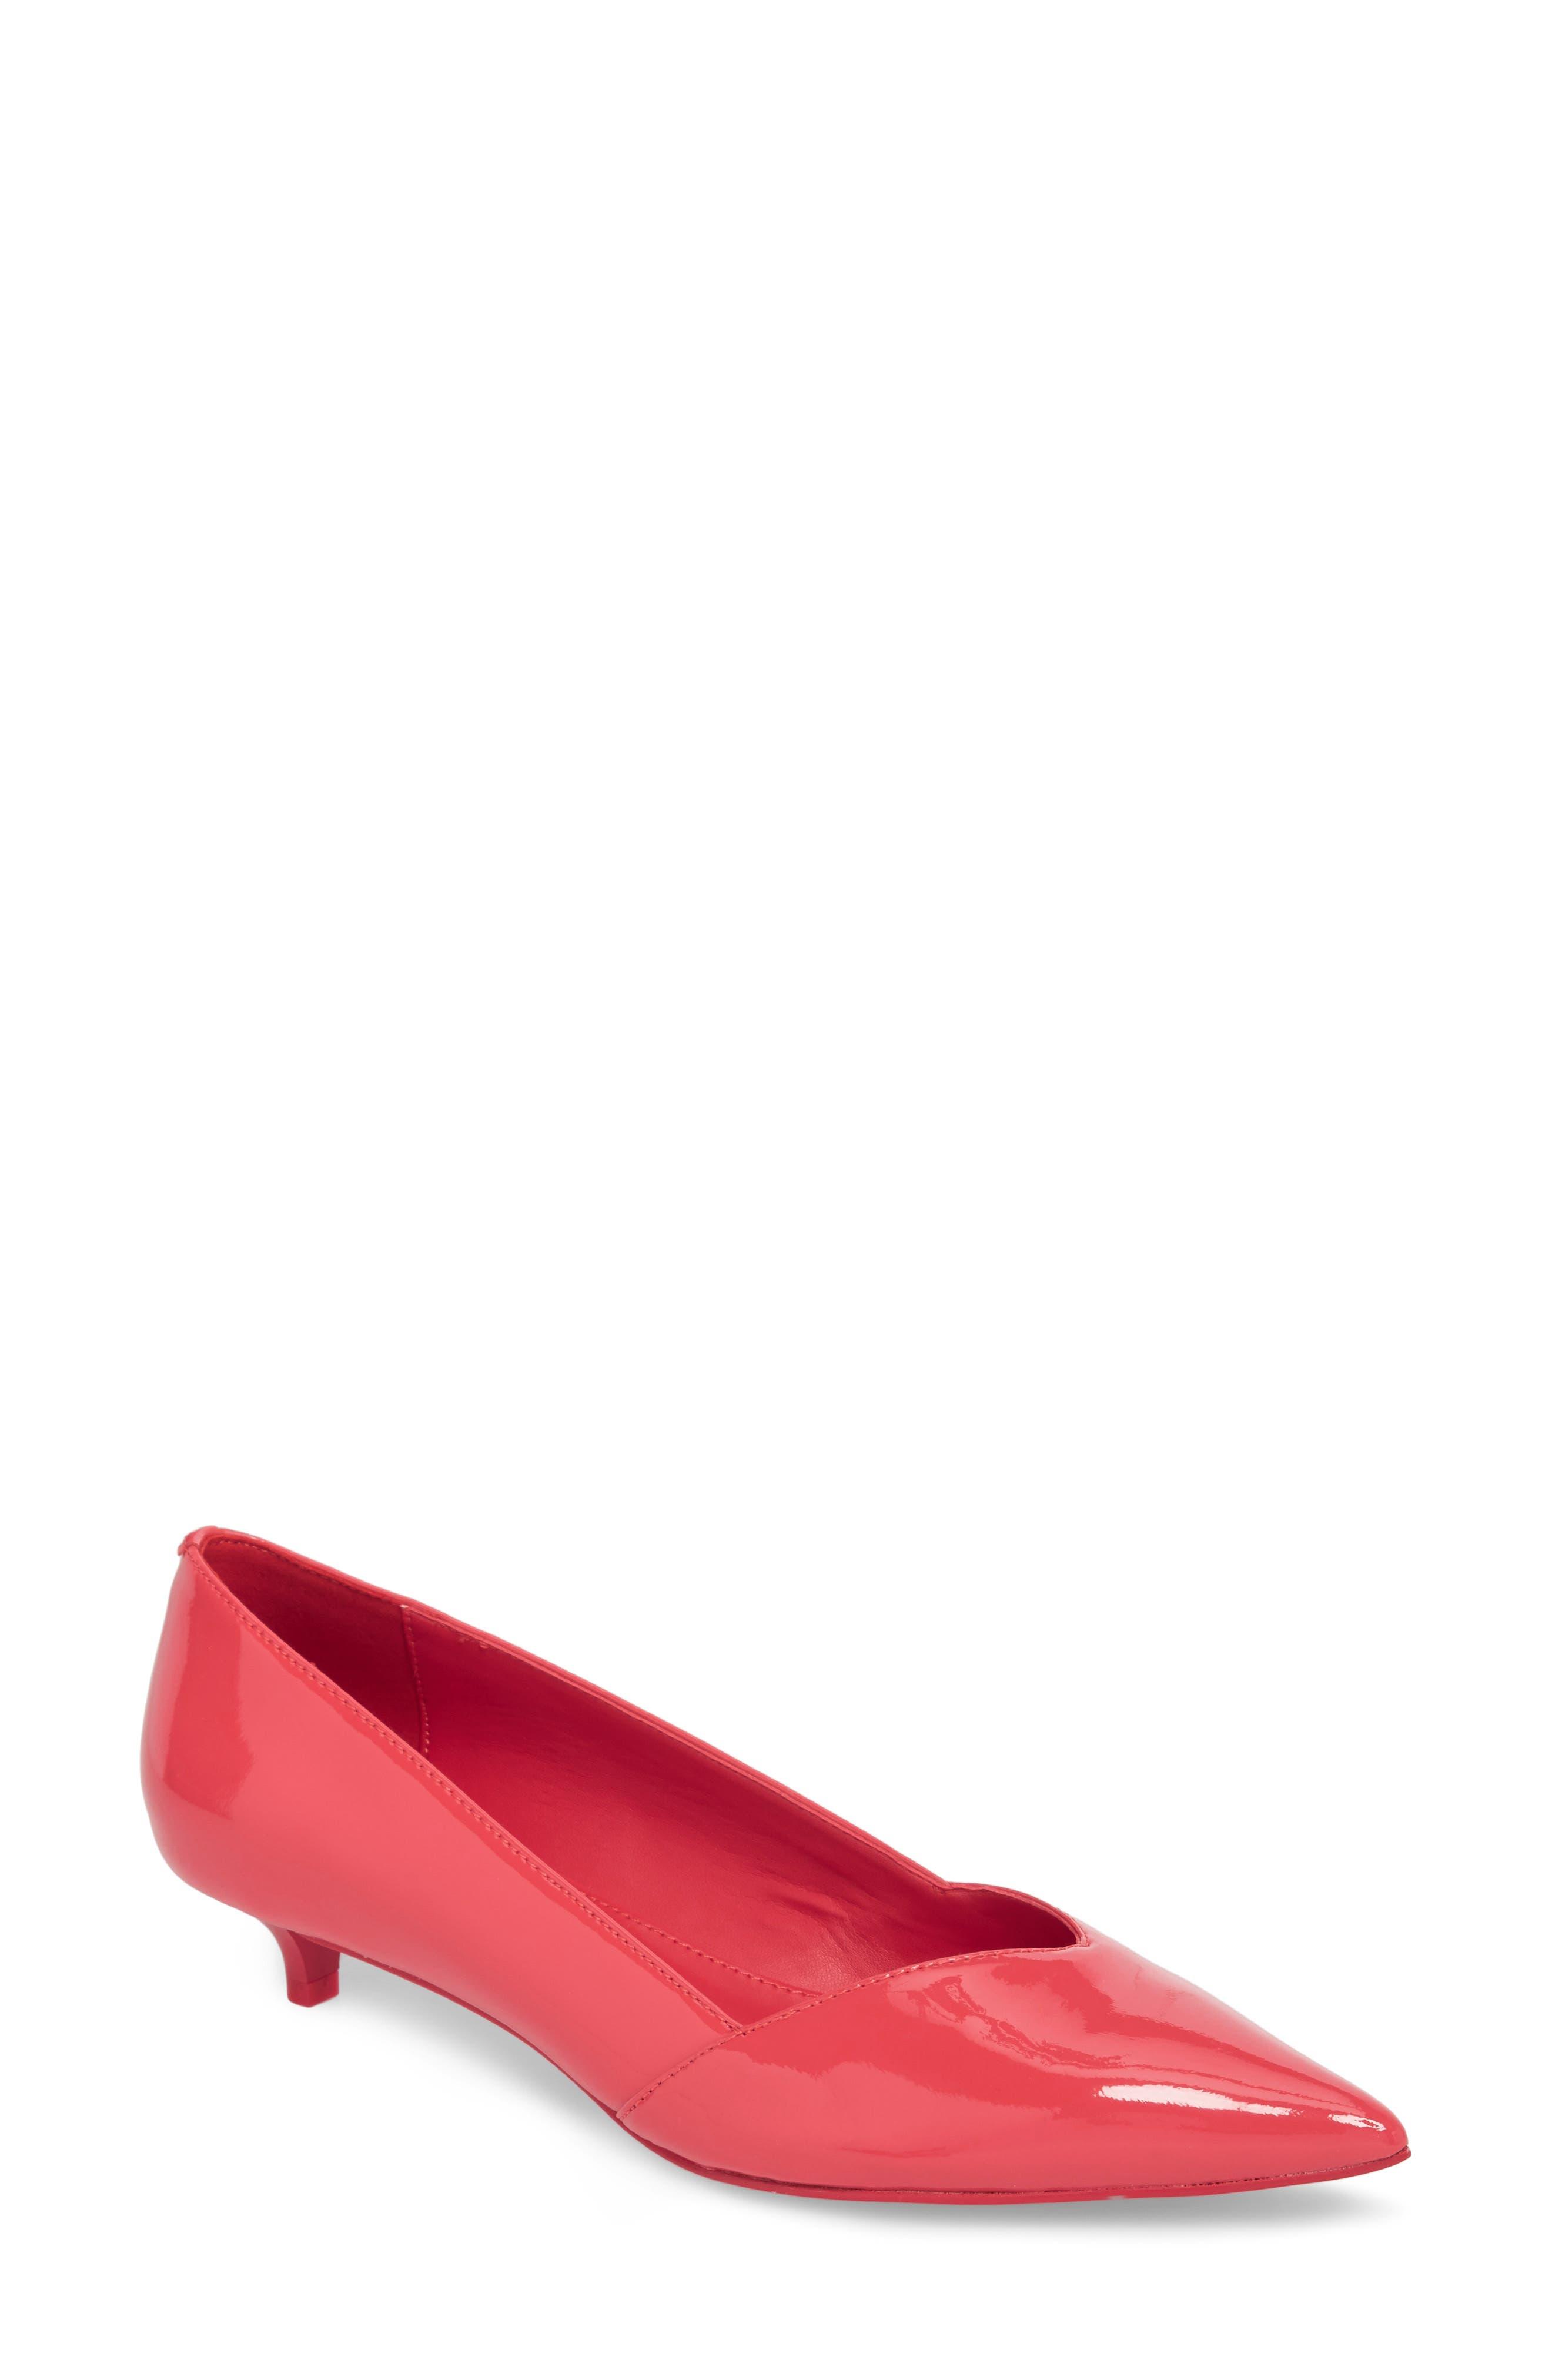 Mai Kitten Heel Pump,                         Main,                         color, ROSE QUARTZ LEATHER